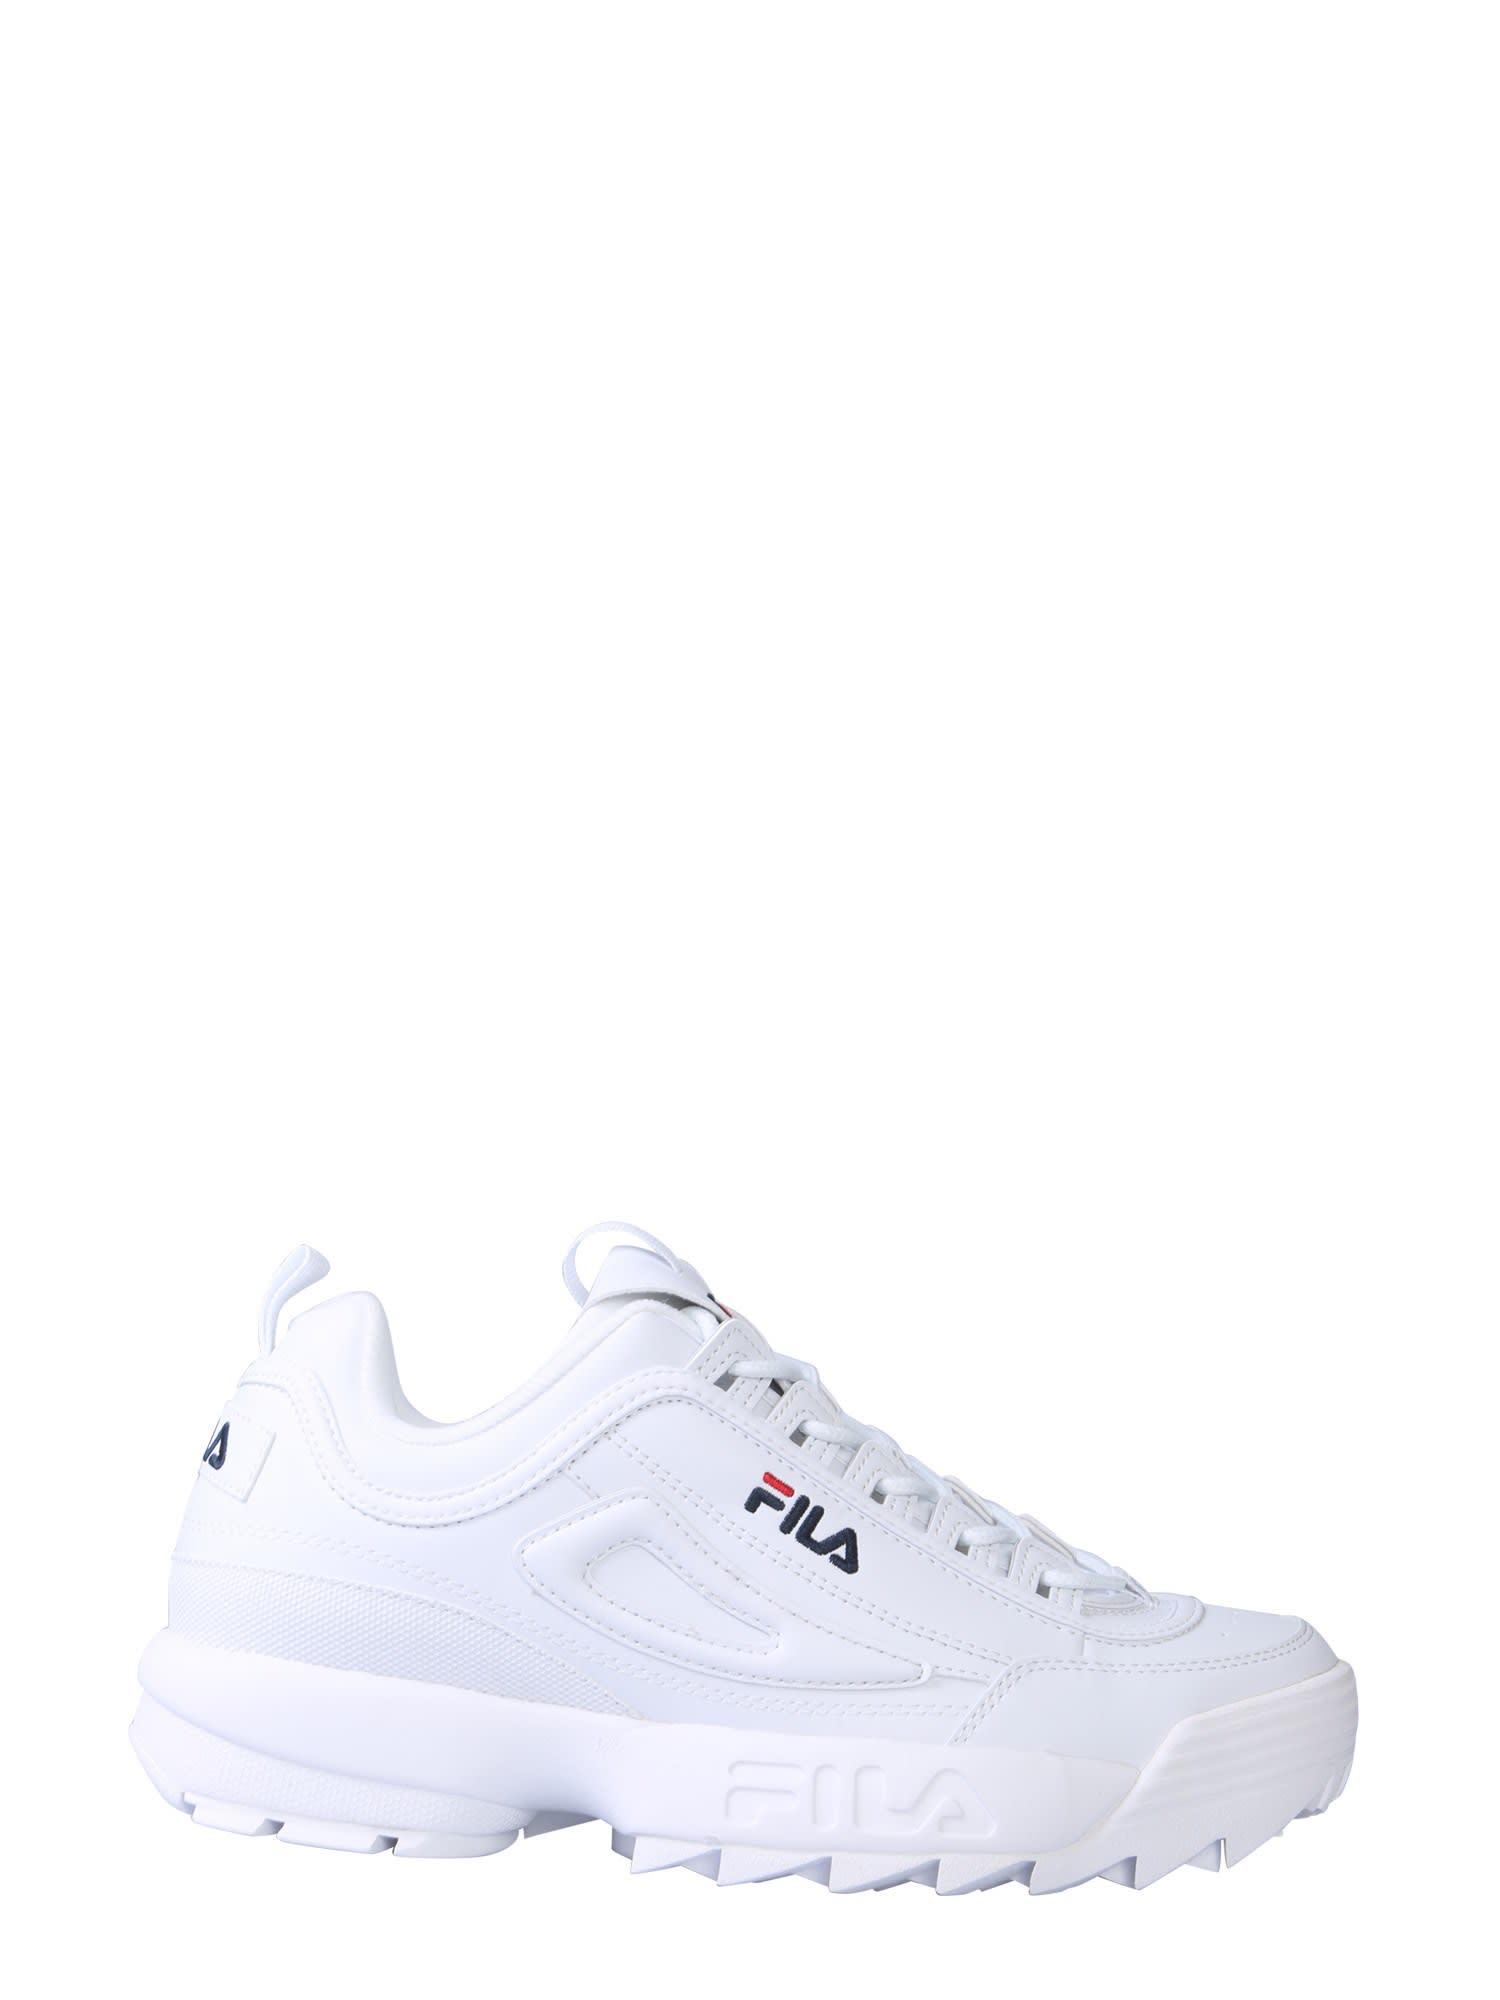 Fila Disruptor Low Sneaker